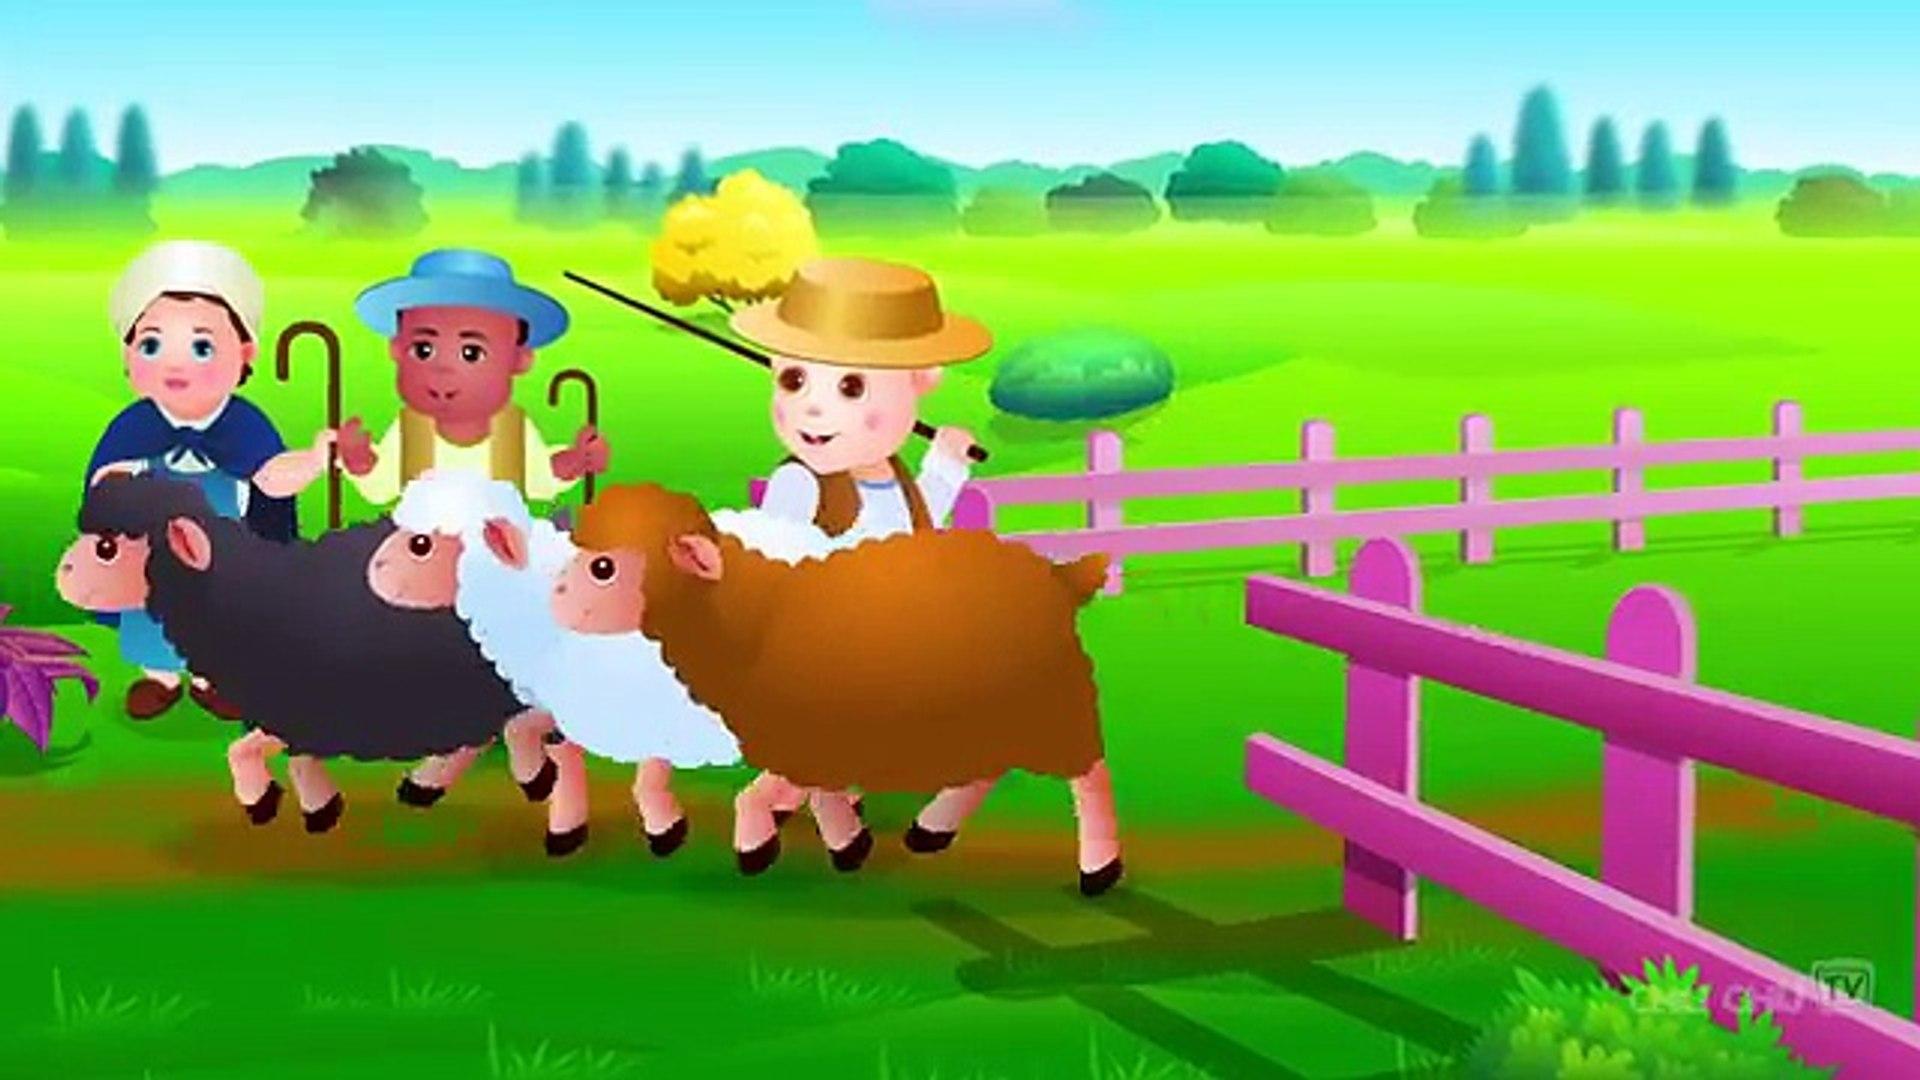 Kids' Education - Baa Baa Black Sheep for Nursery Kids